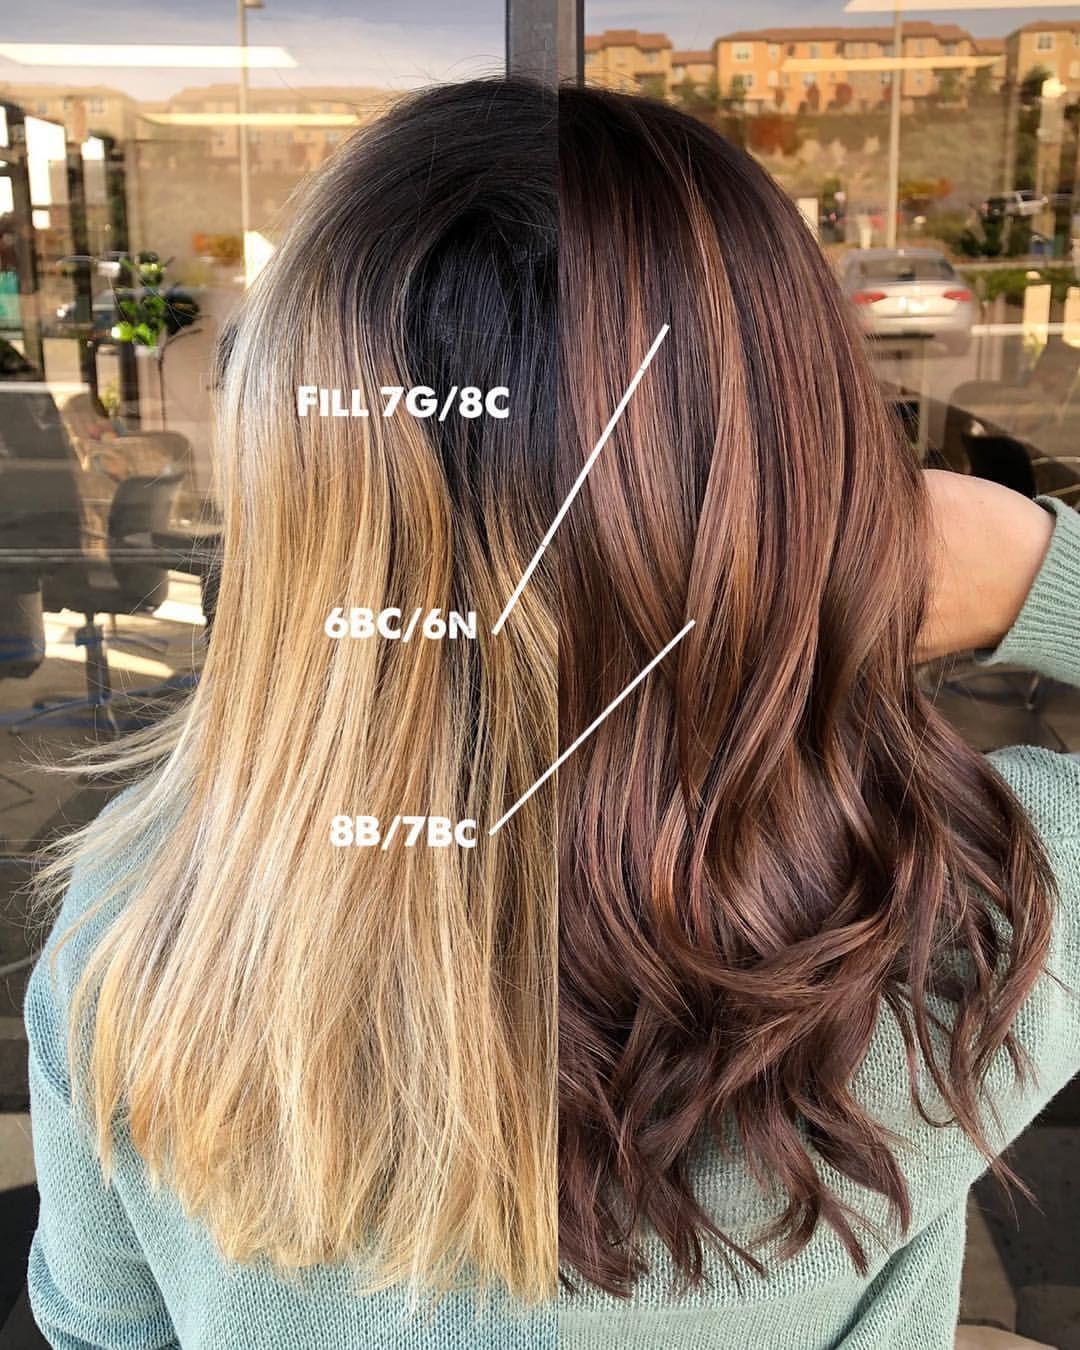 Lets Talk About Fillers Going From Blonde To Brunette Mirella Manelli Brunette Hair Color